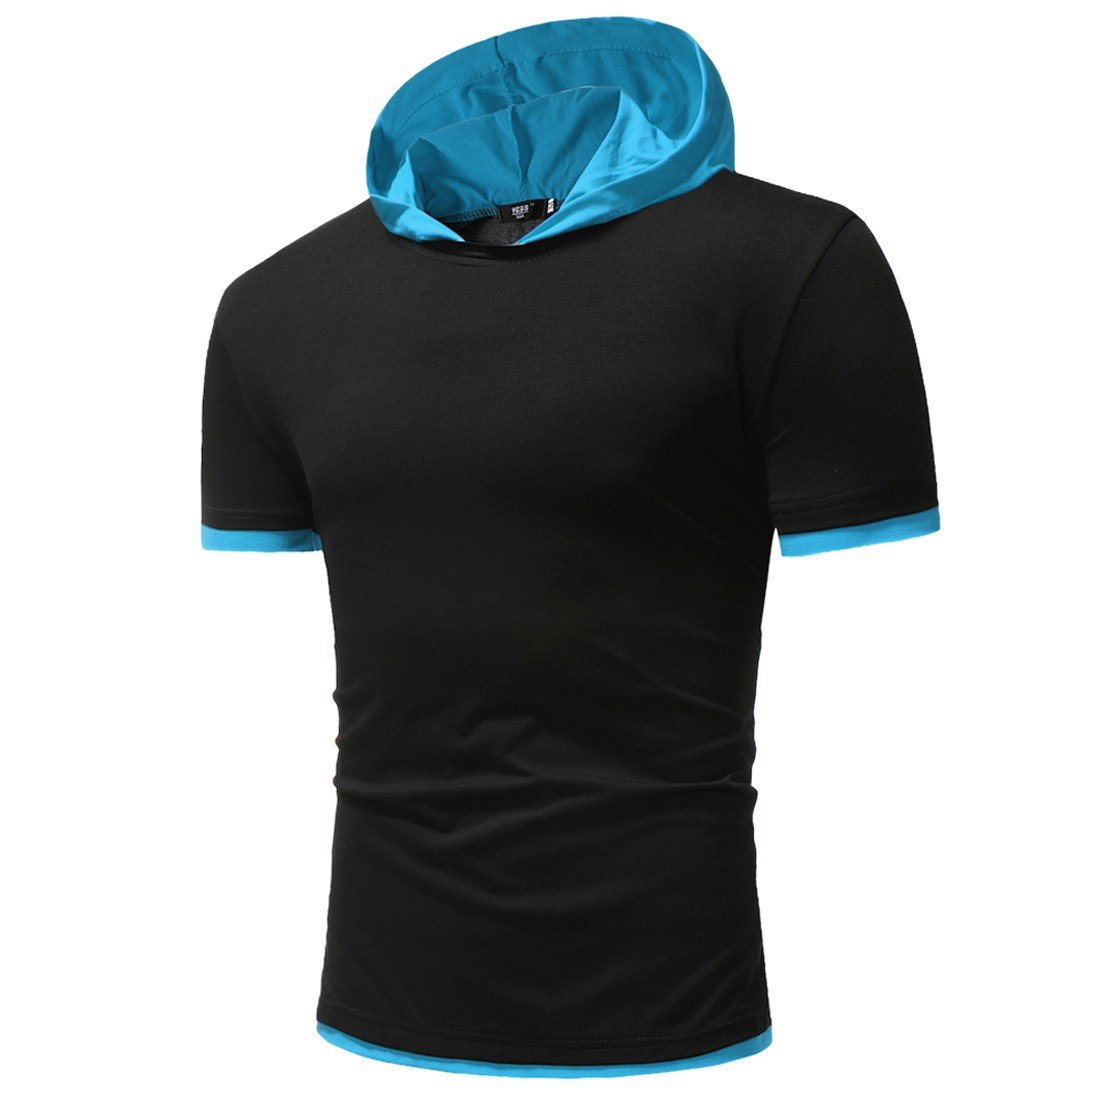 Paixpays Mens Hipster Hip Hop Short Sleeve Longline Hoodies Shirts